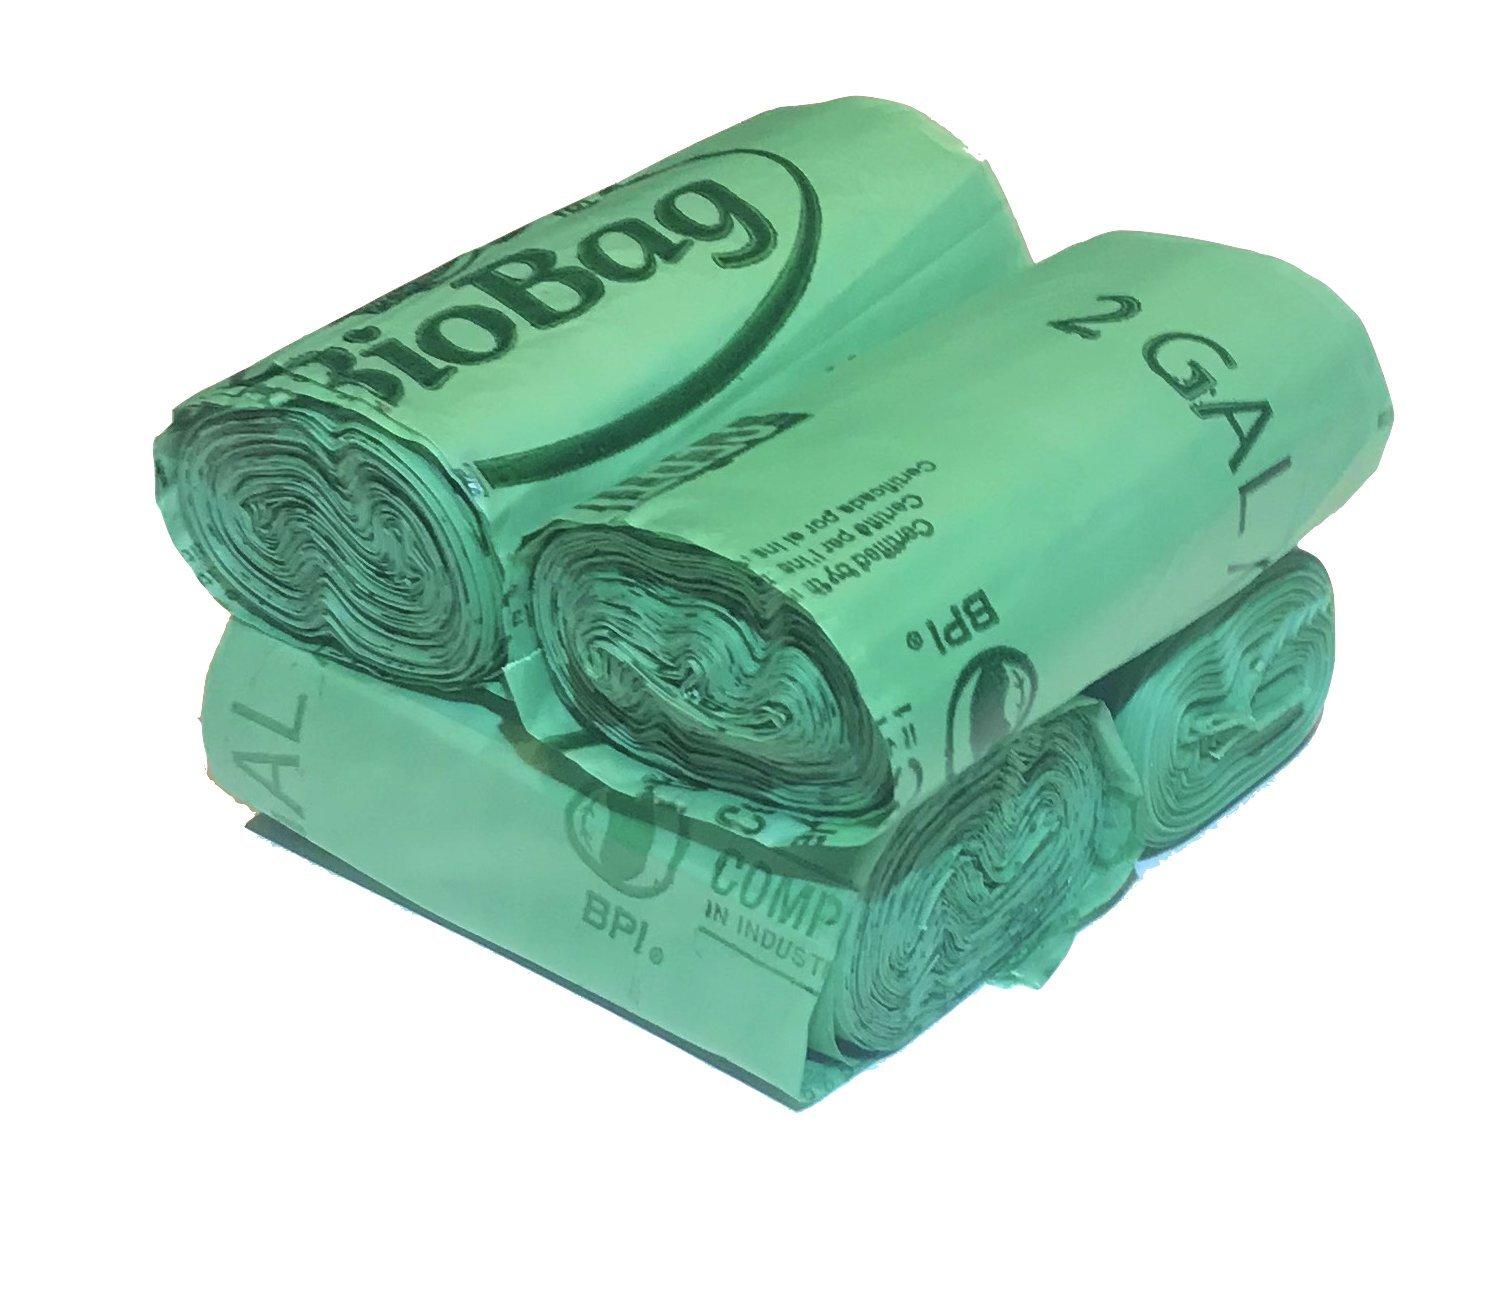 Amazon.com: BioBag 2 Gallon Compostable Liner (100 ct): Health ...